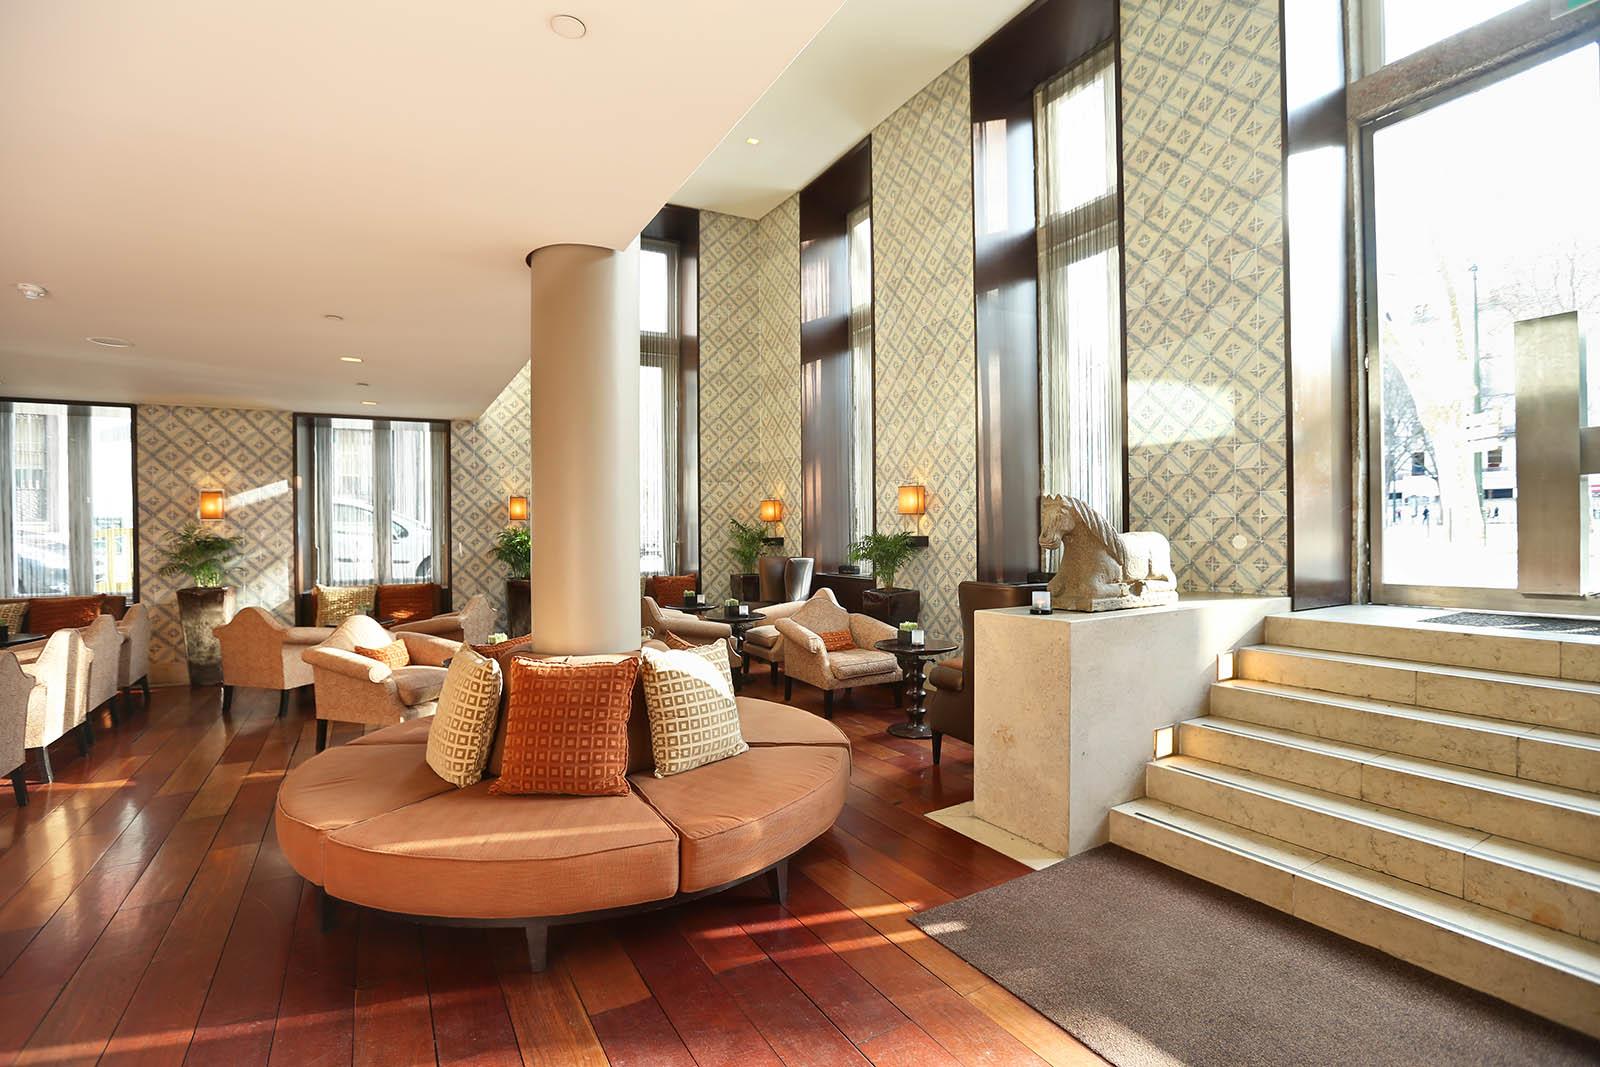 Heritage Avenida Liberdade Hotel recomendado pelo Telegraph